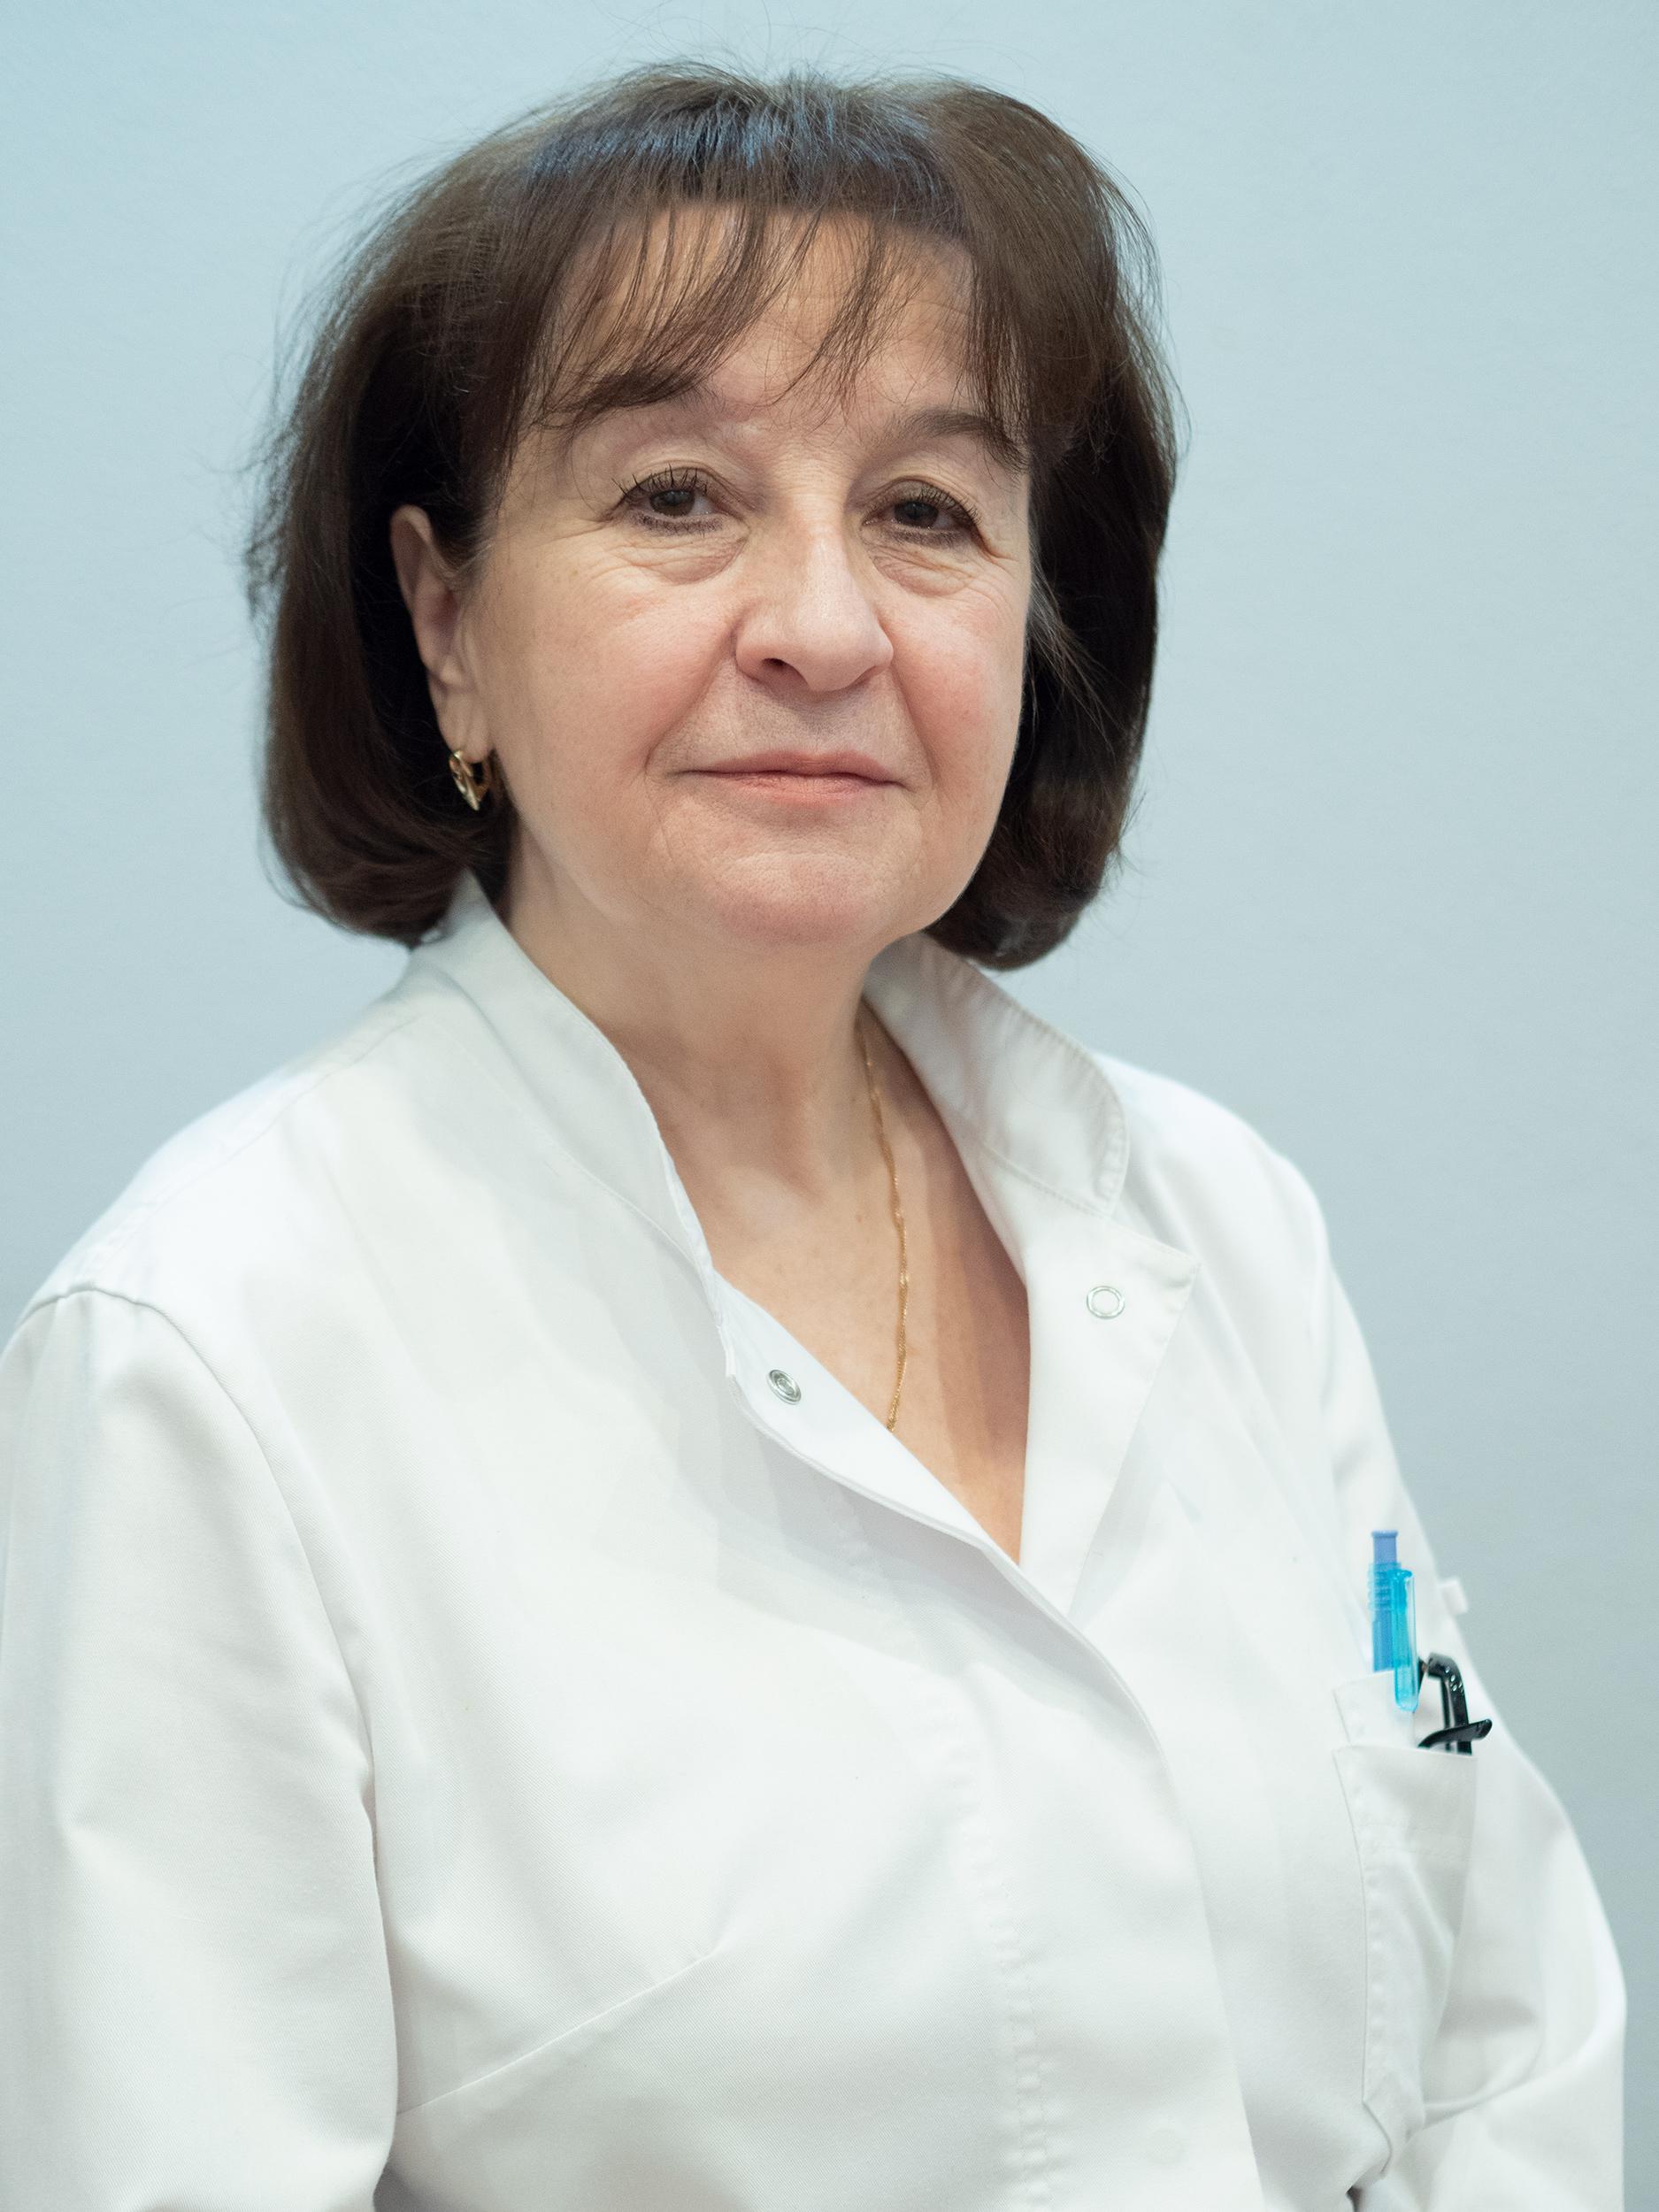 Богданова Галина Сергеевна